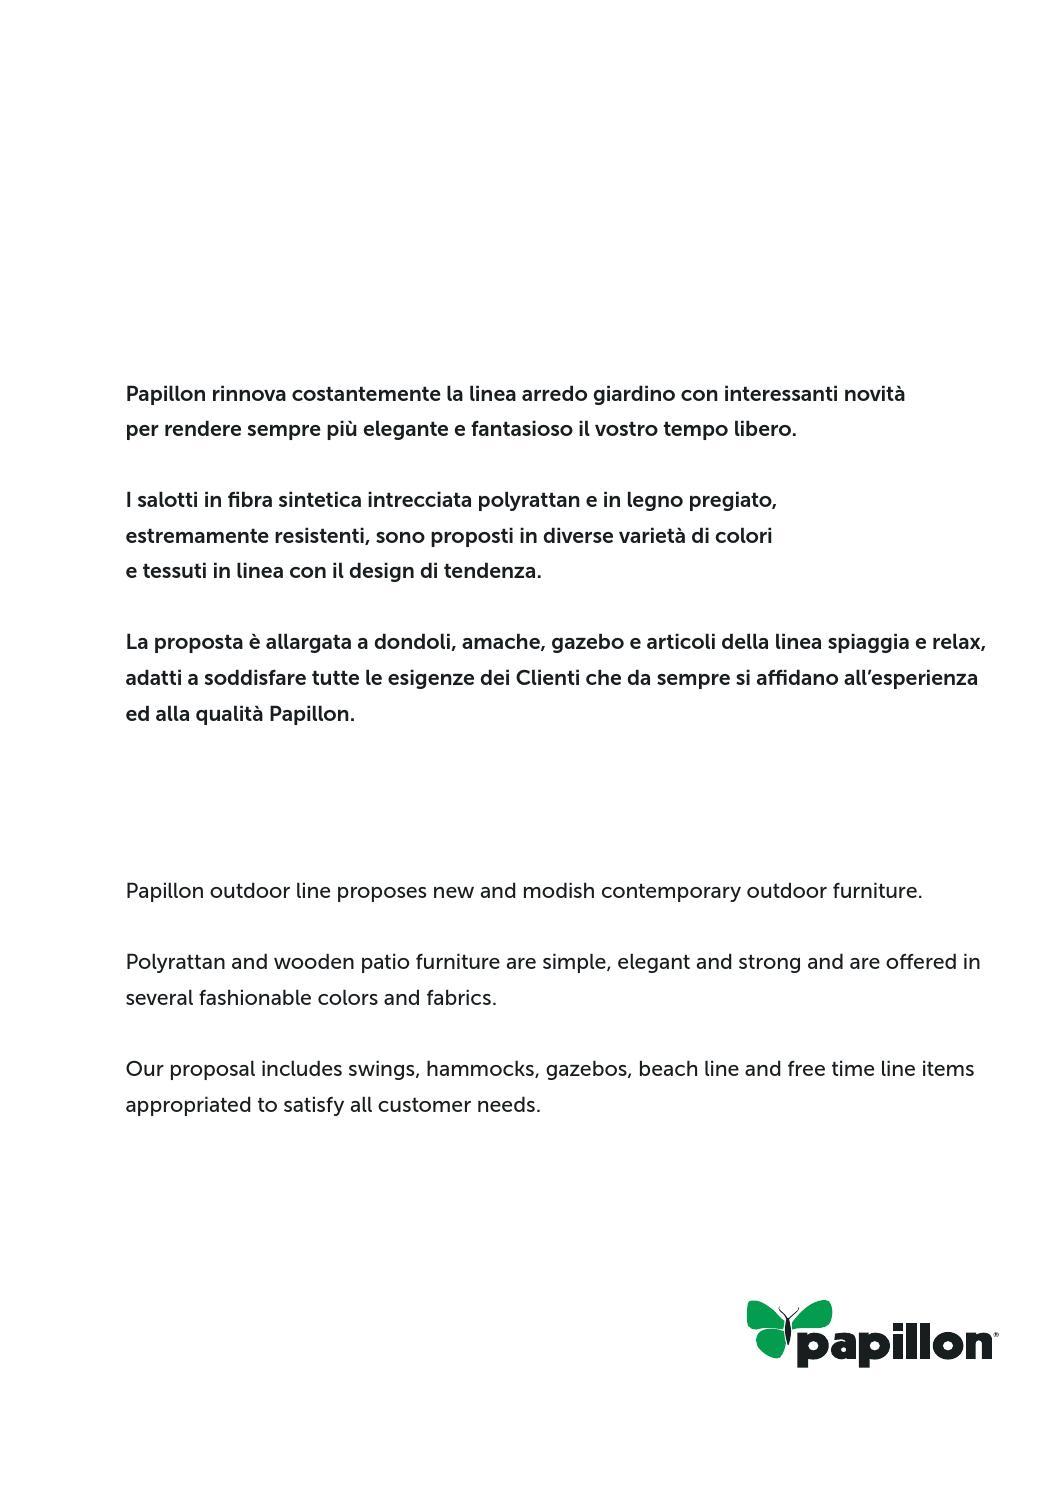 Catalogo generale arredo giardino by ideapratica issuu for Arredo giardino catalogo